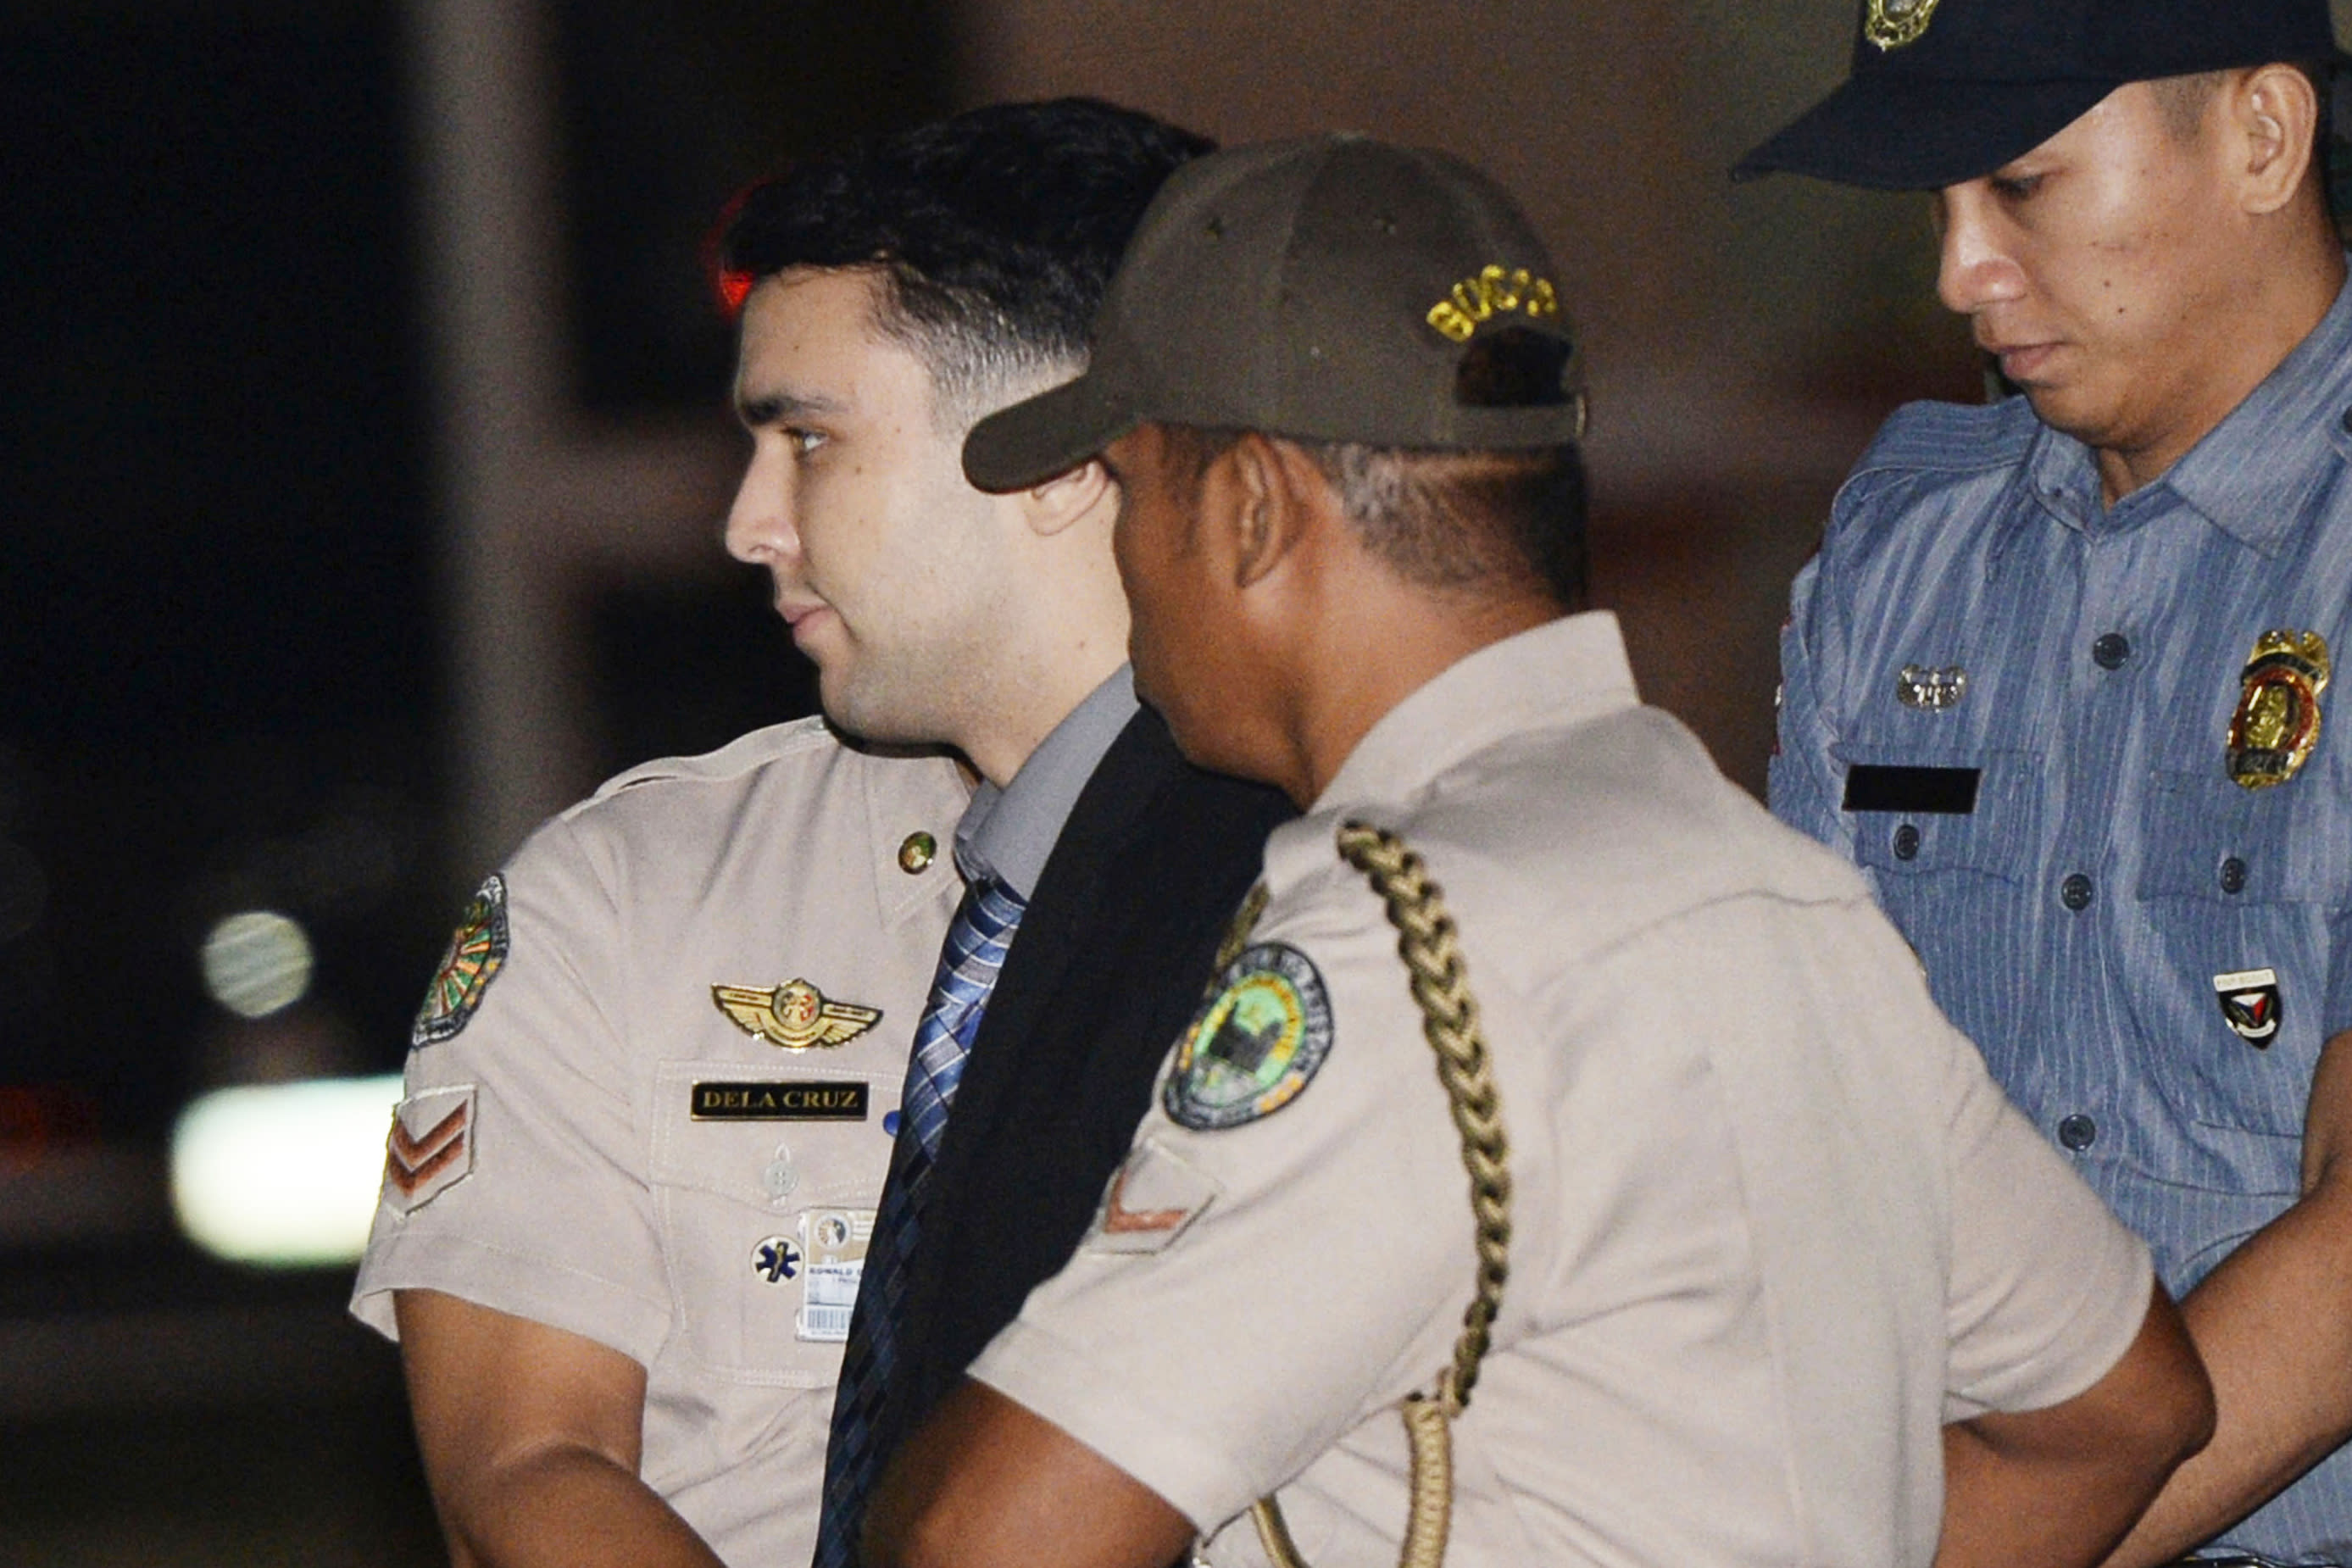 Jennifer Laude case: Duterte pardons United States  marine over transgender killing